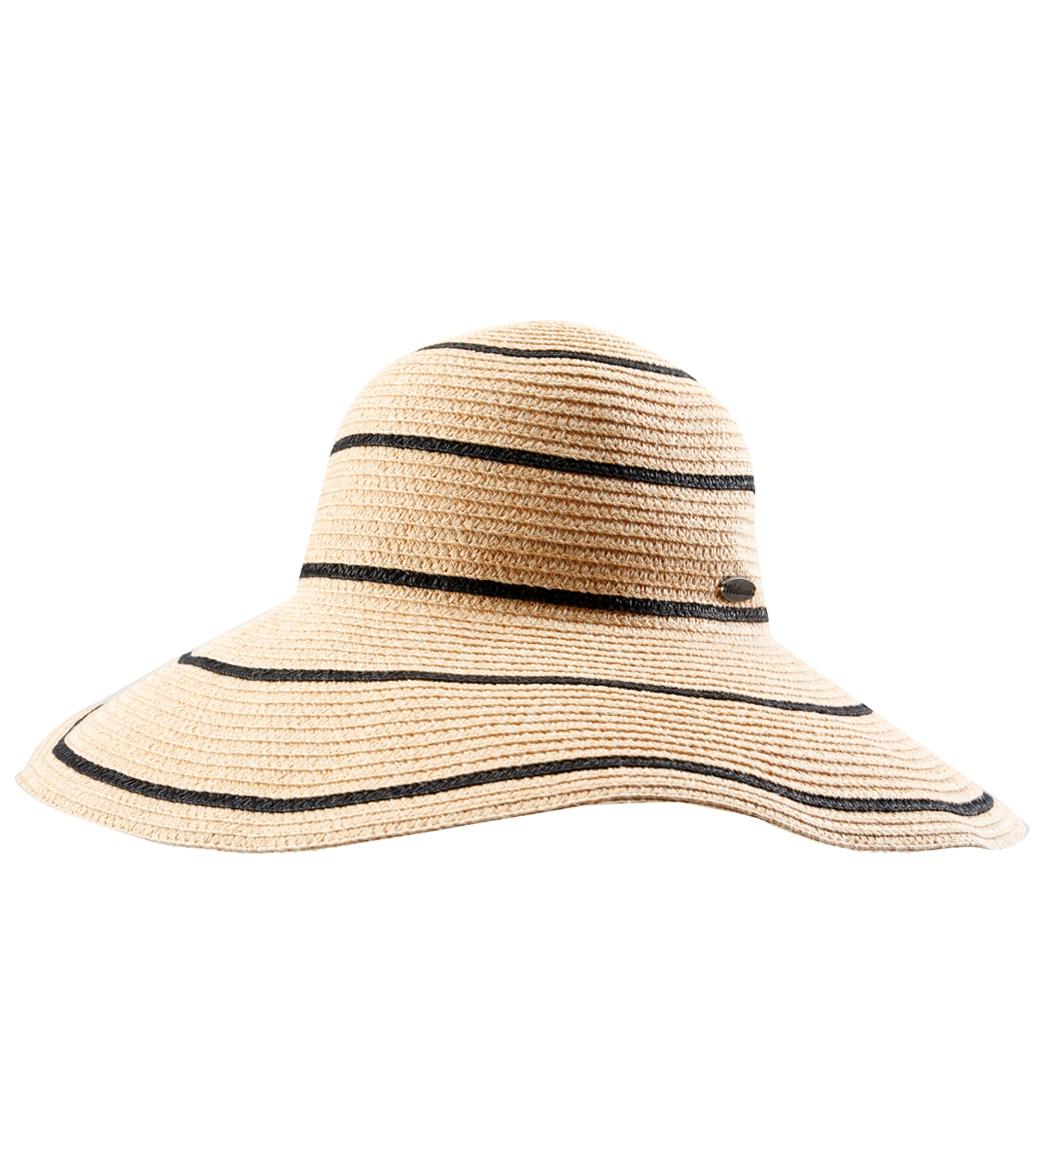 d5a5b1f8 Wallaroo Women's Savannah Sun Hat at SwimOutlet.com - Free Shipping